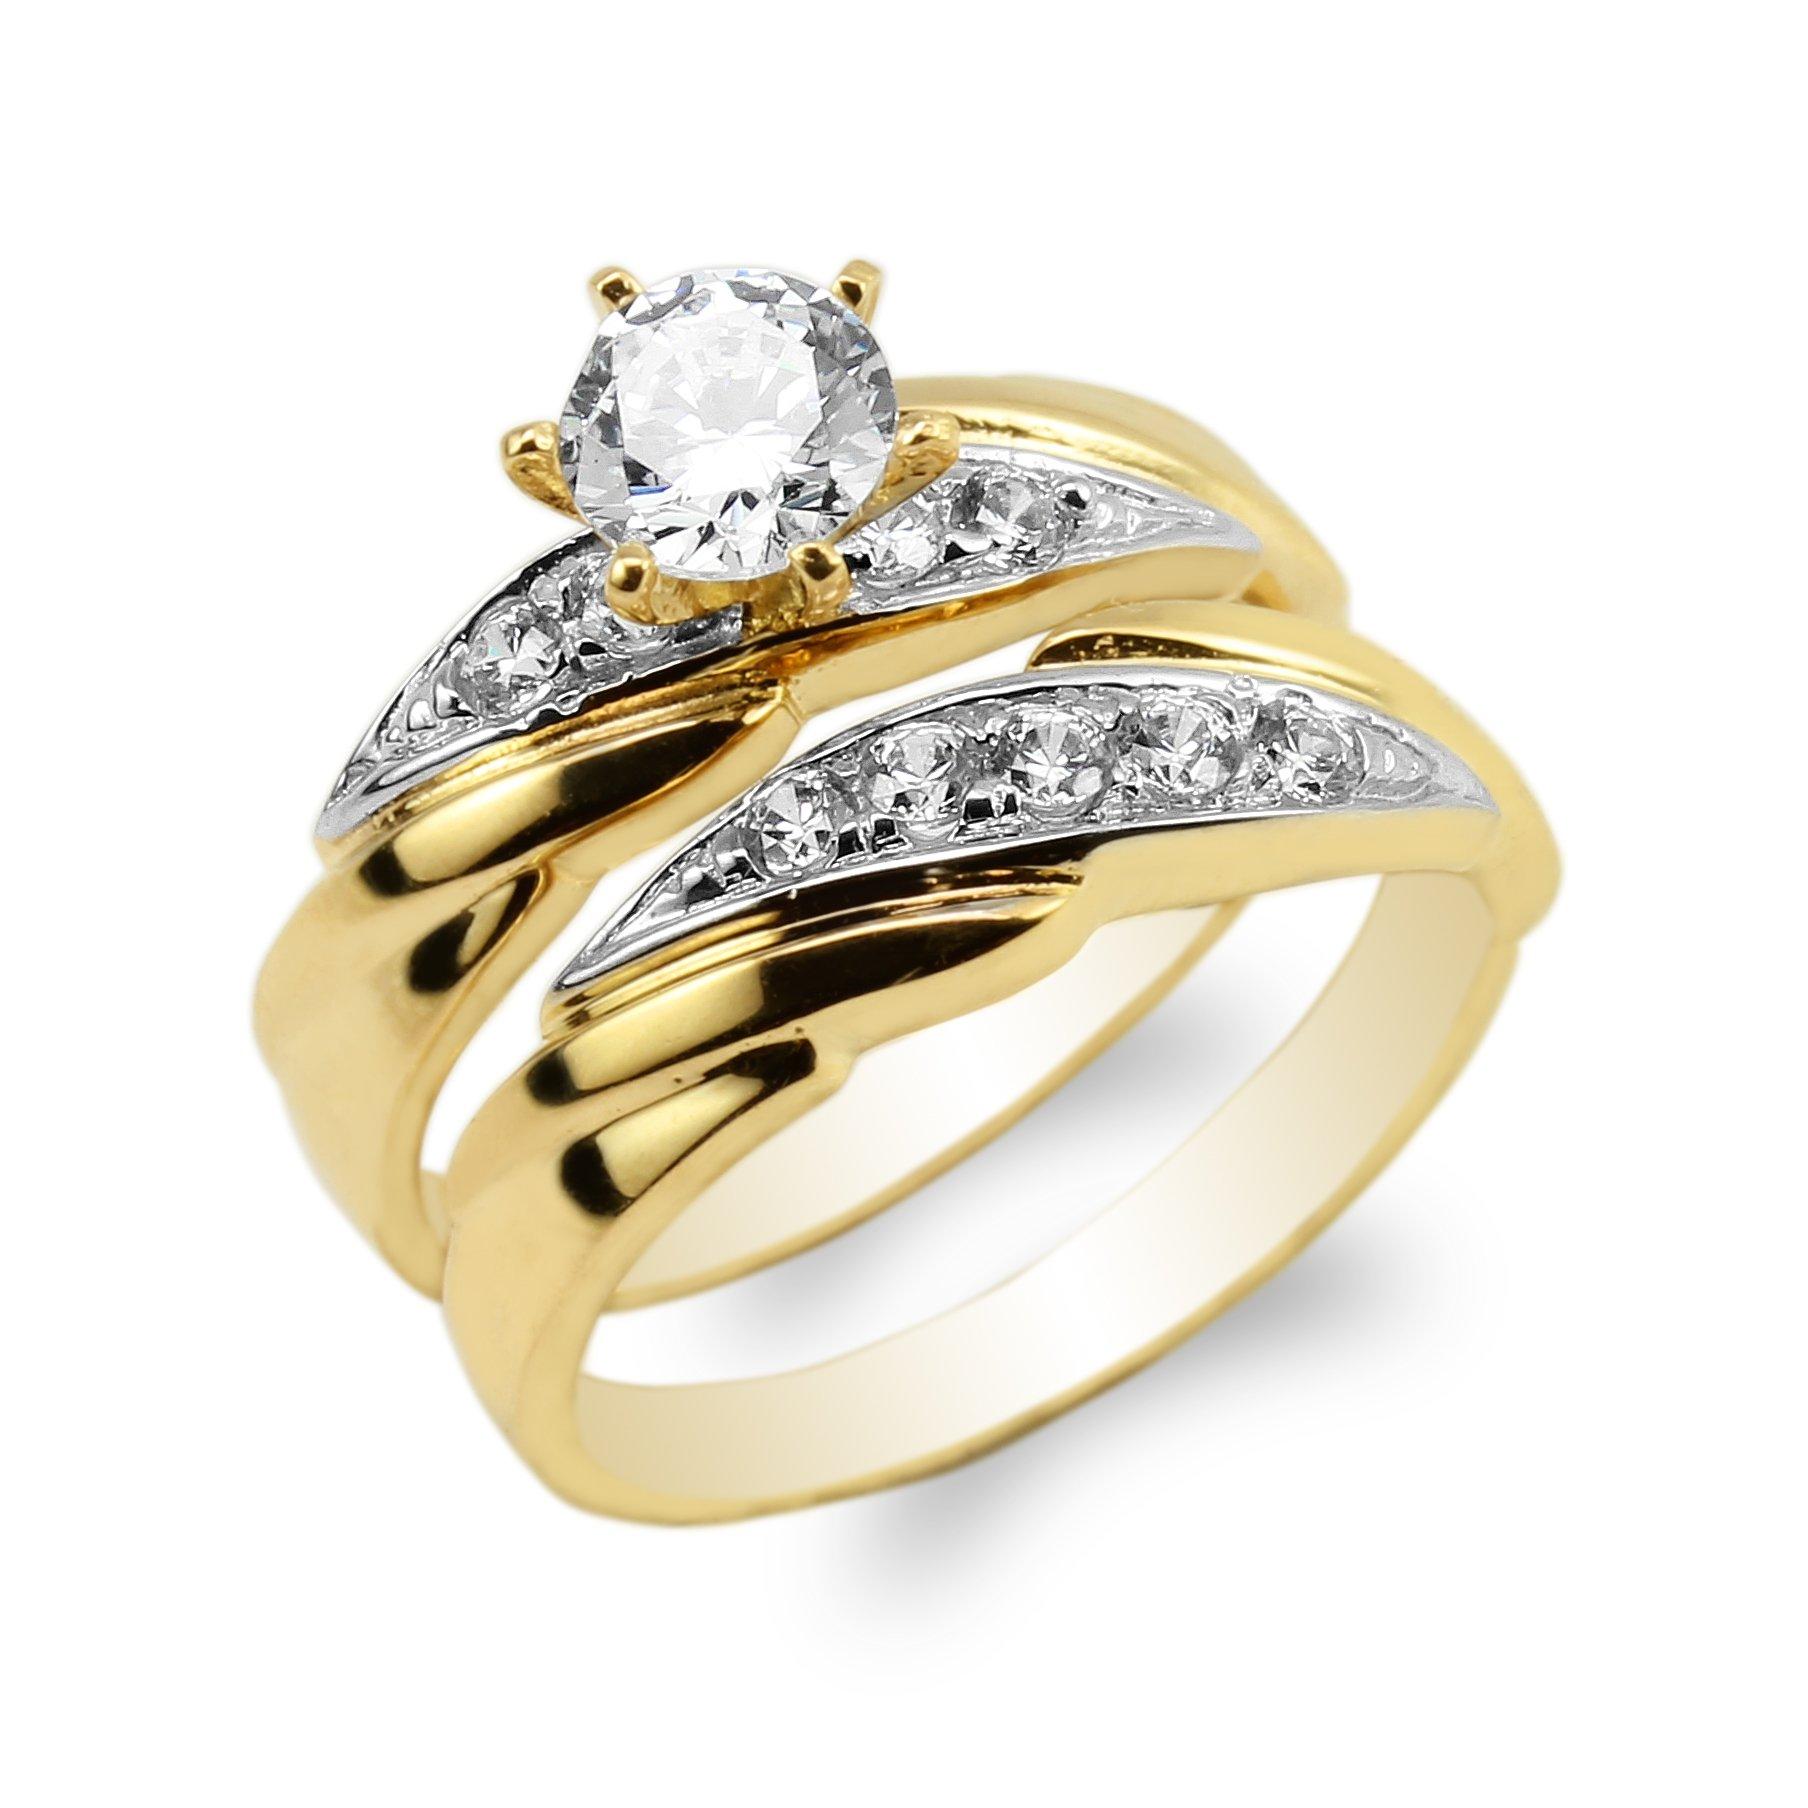 JamesJenny 10K Yellow Gold Duo Set Two Tone Colored Luxury Wedding Ladies Ring Size 9